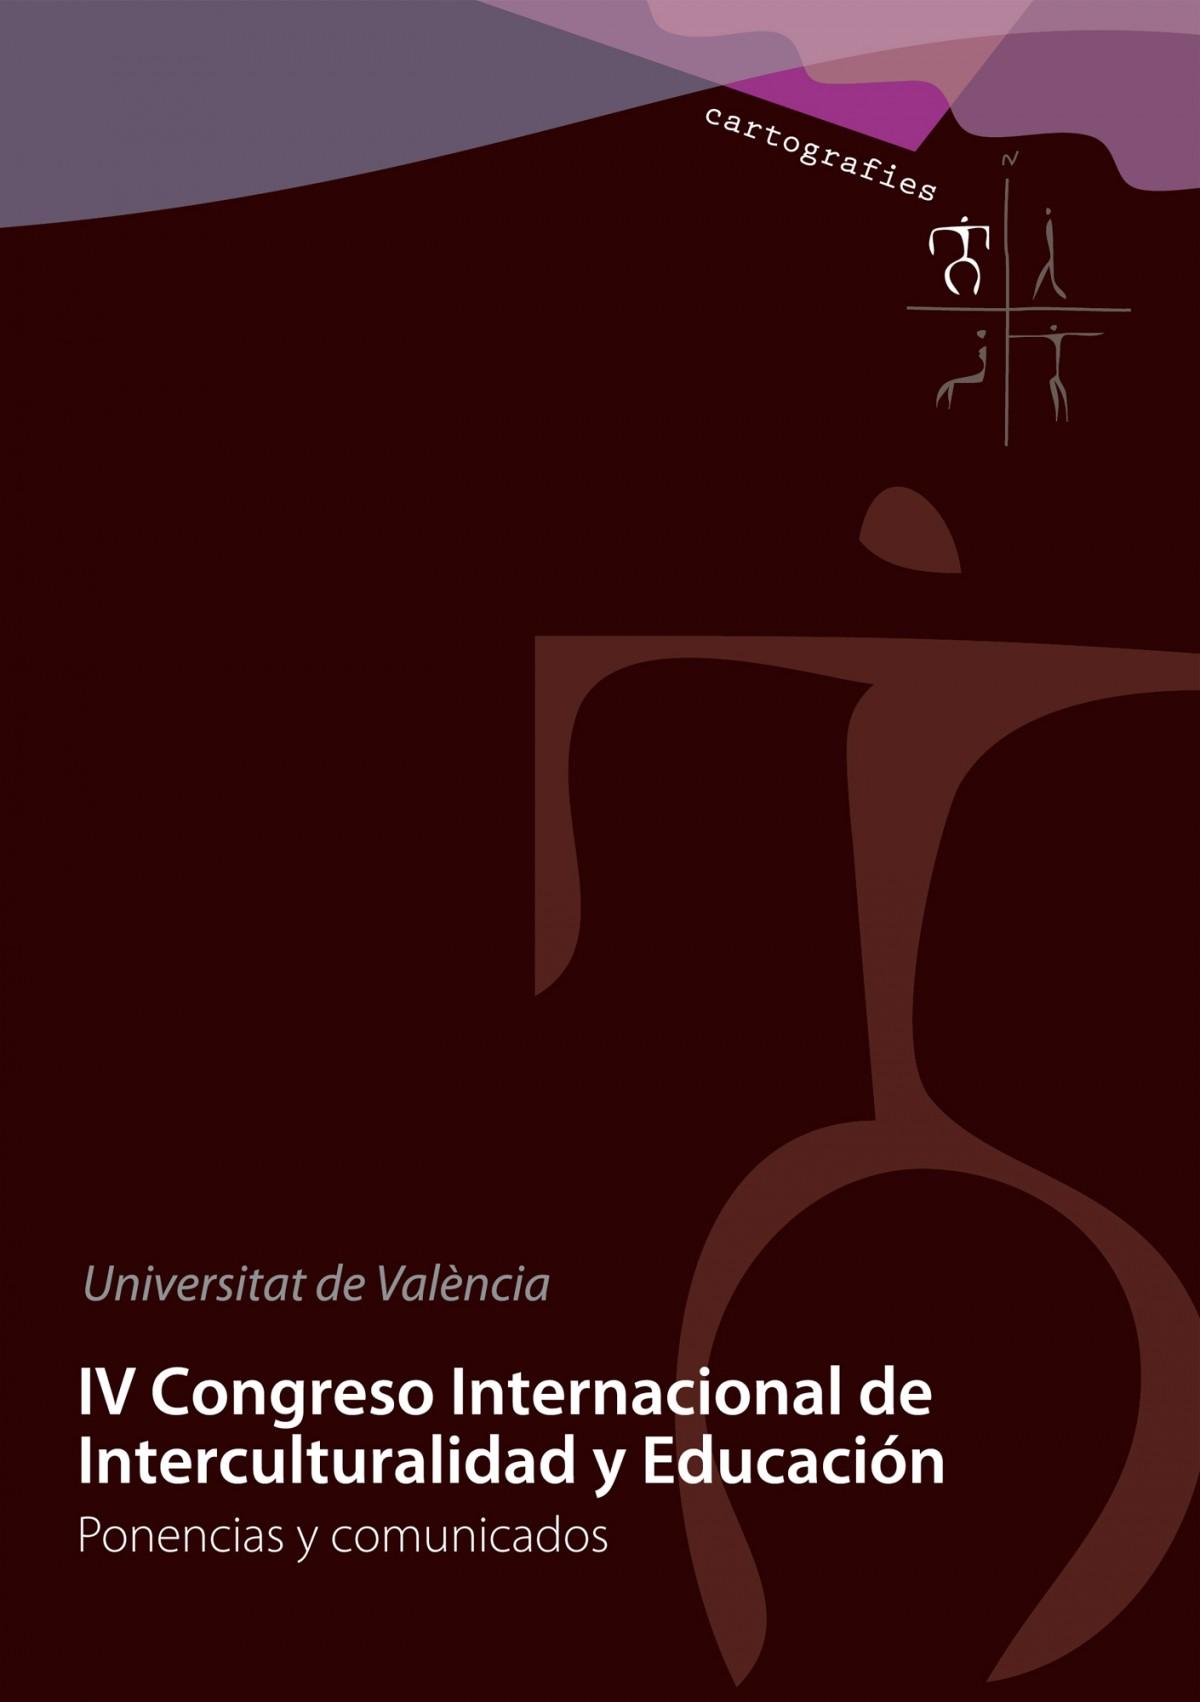 portada-3-Col-Cartografies-Periferic-disseny-Paco-Gimenez